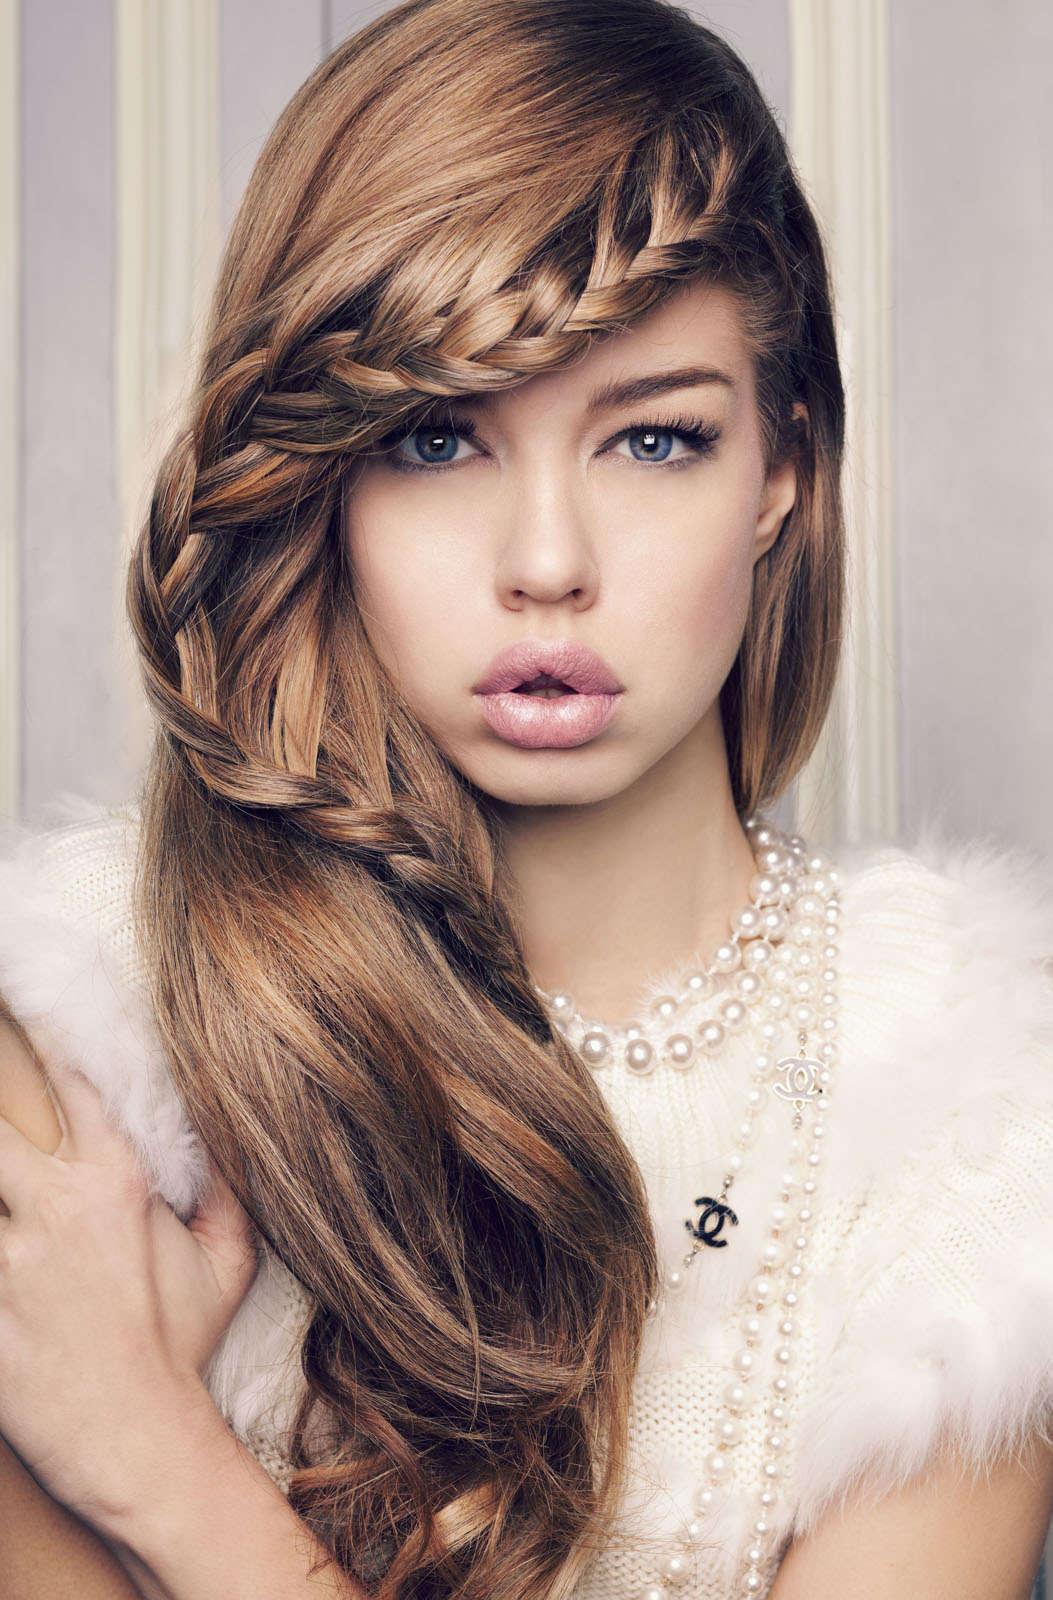 Strange 24 Gorgeously Creative Braided Hairstyles For Women Styles Weekly Short Hairstyles Gunalazisus